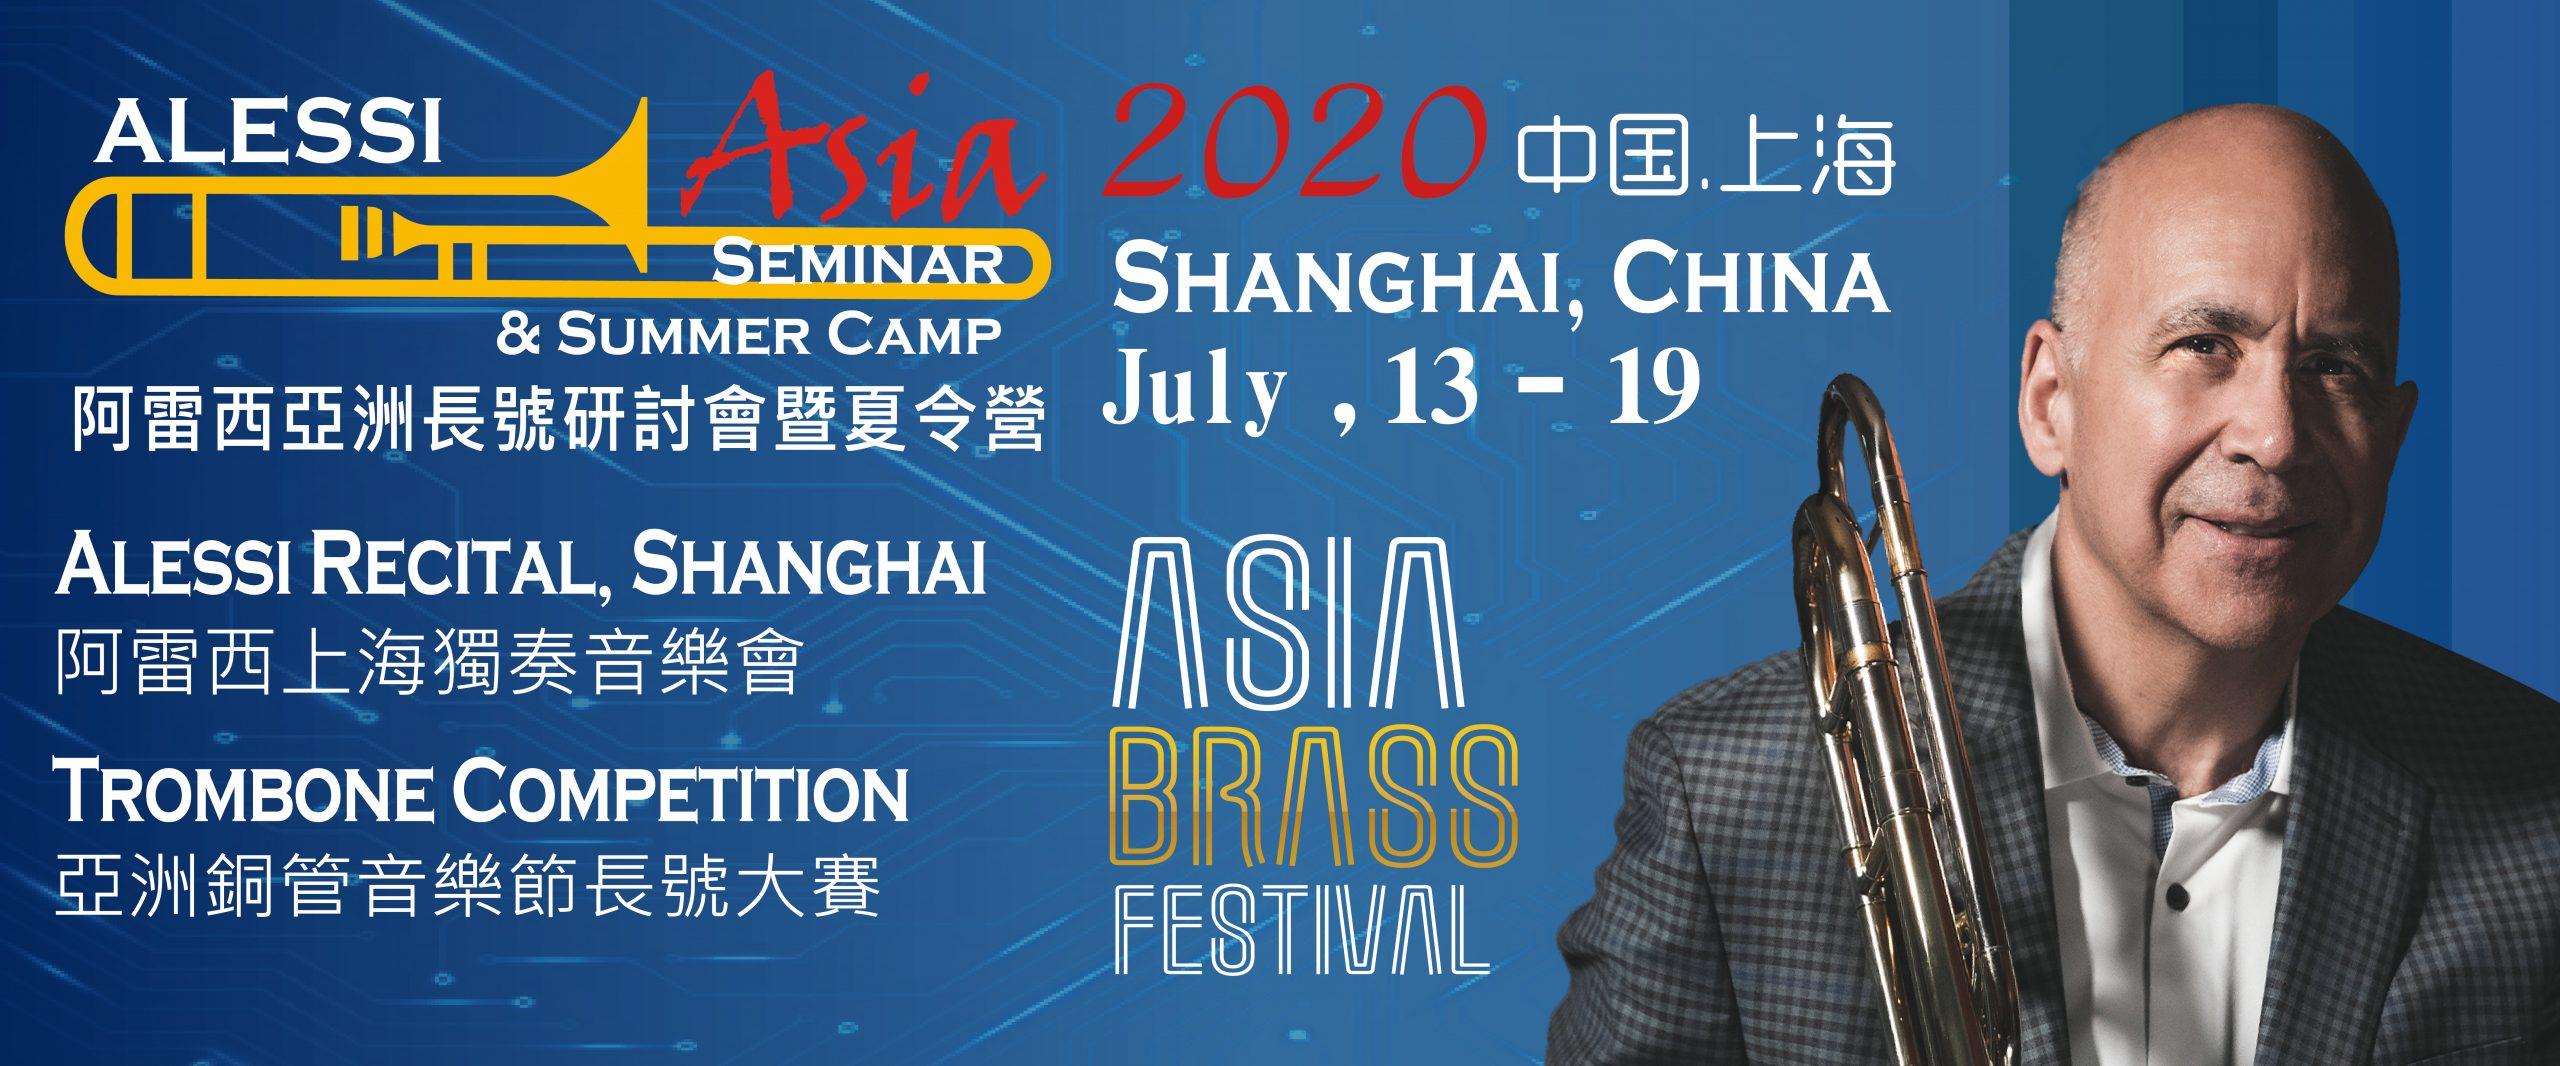 亚洲铜管音乐节 – Alessi Seminar Asia & Summer Camp 消息公布